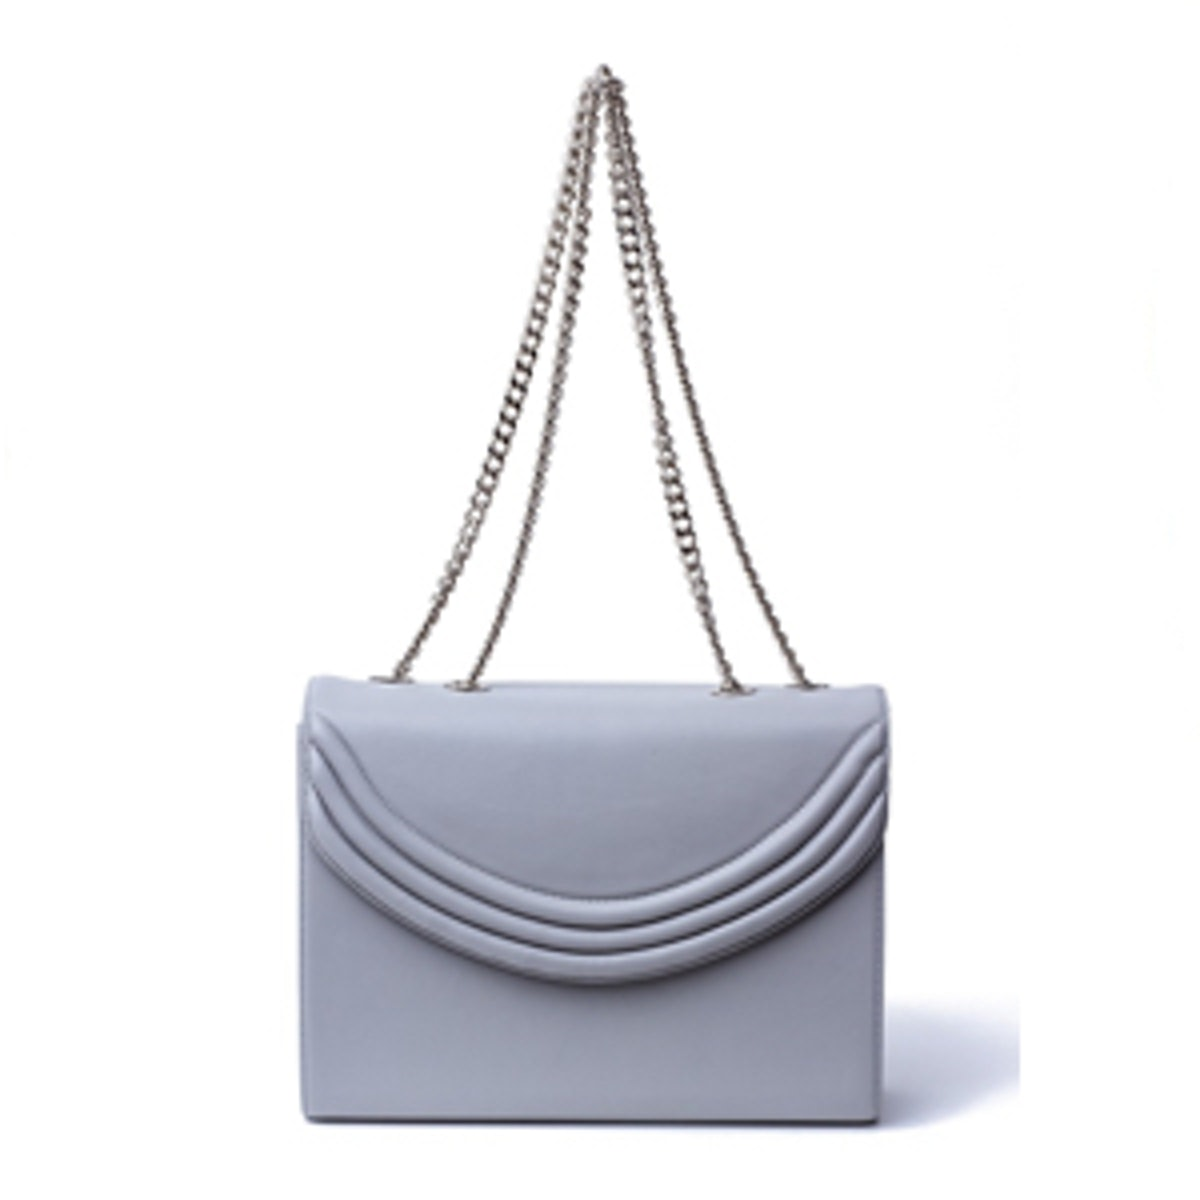 Mezzo Gray Medium Cross-Body Bag